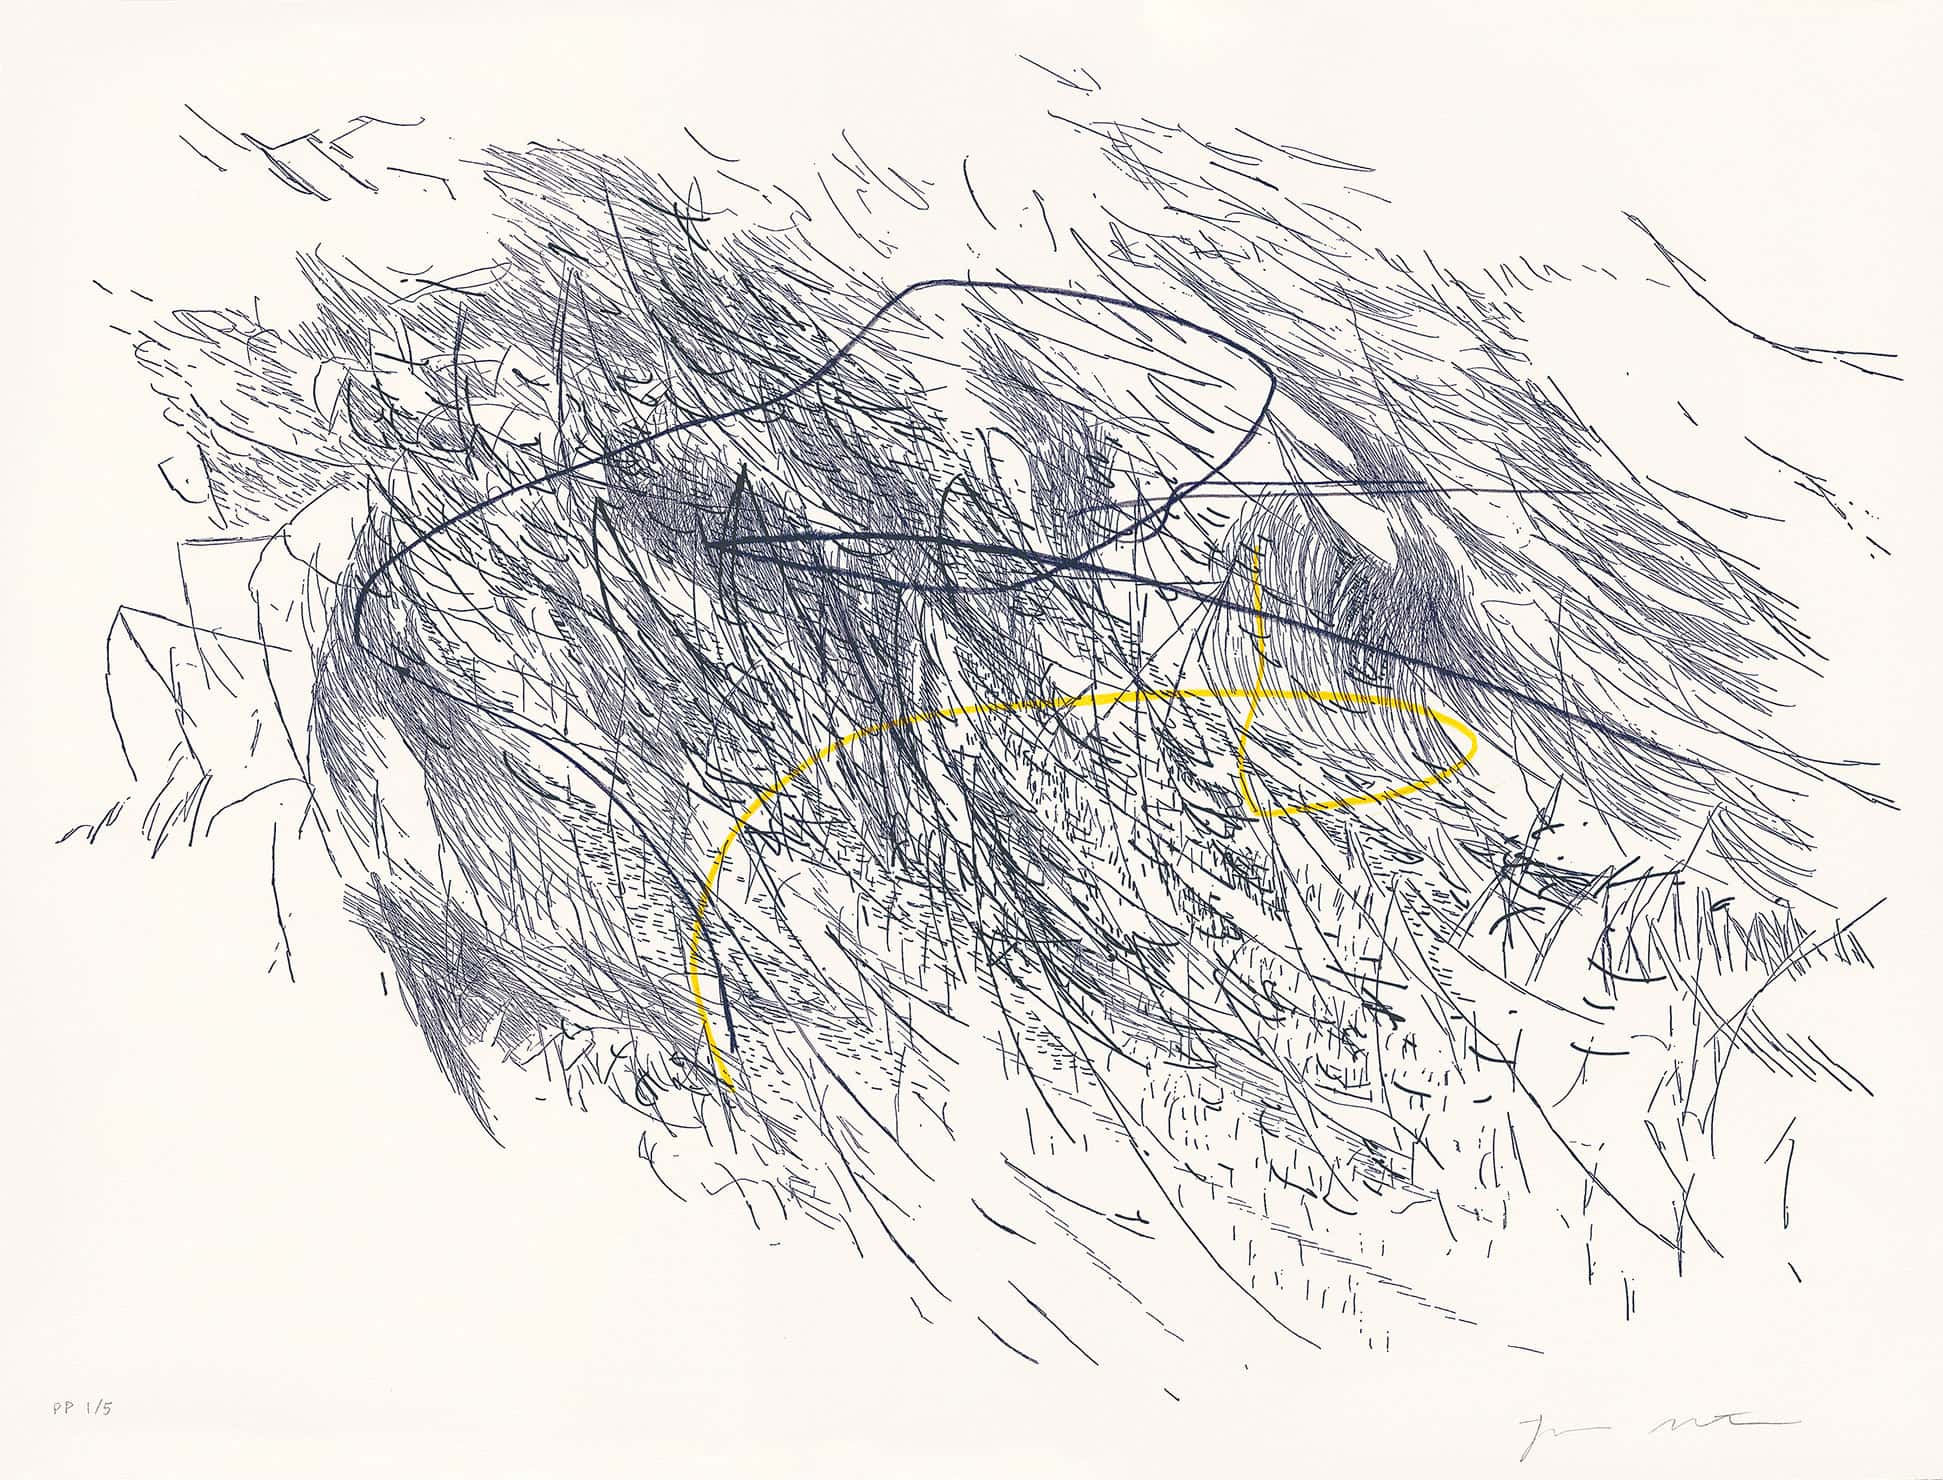 Sappho-Strophe-2.color.jpg